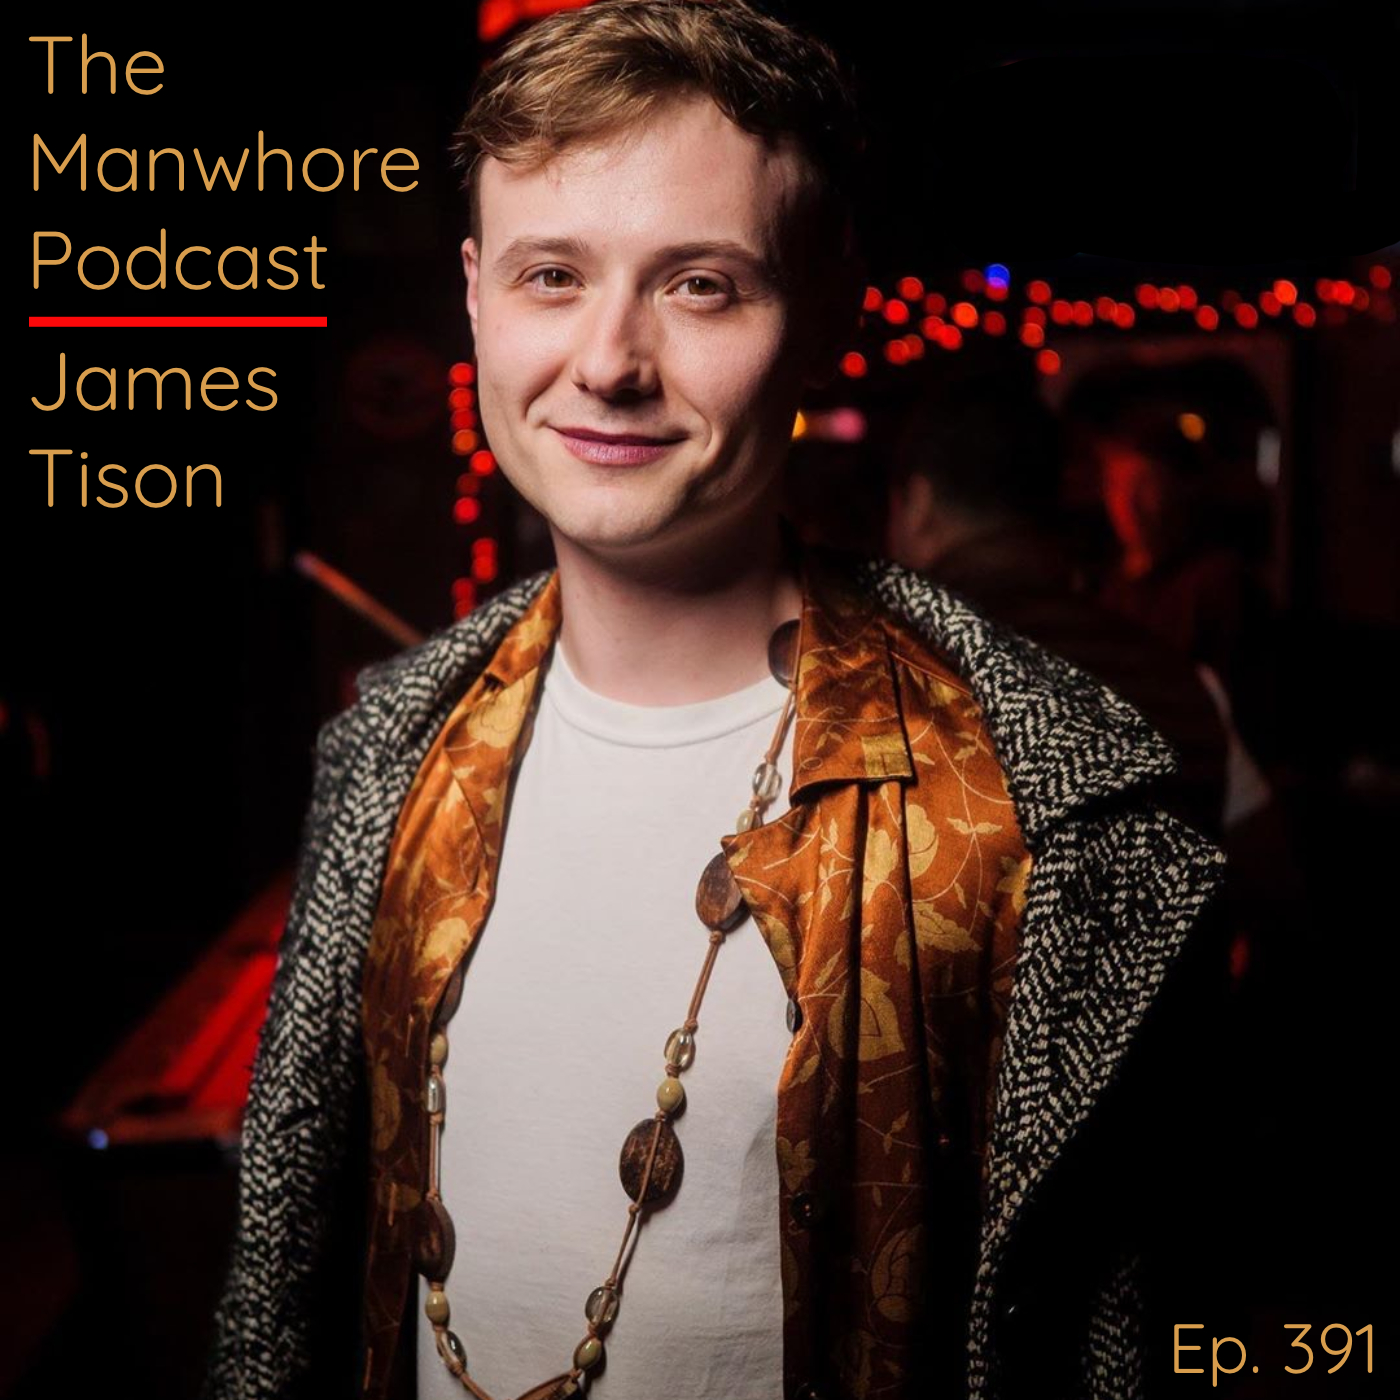 The Manwhore Podcast: A Sex-Positive Quest - Ep. 391: Press Your Dumb Man Body Against Me, Please!!! — comedian James Tison